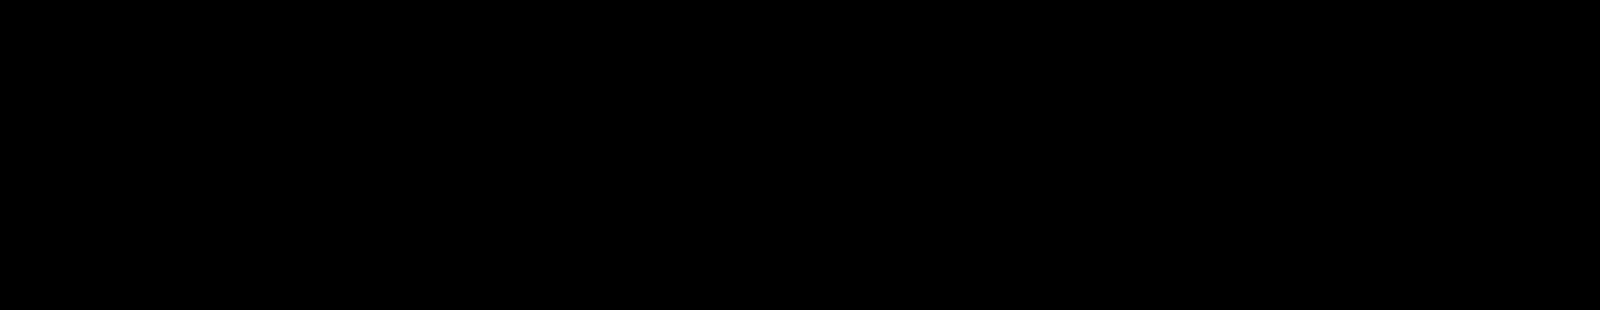 anastasia beverly hills logos download twitter logo transparent gif twitter logo transparent png